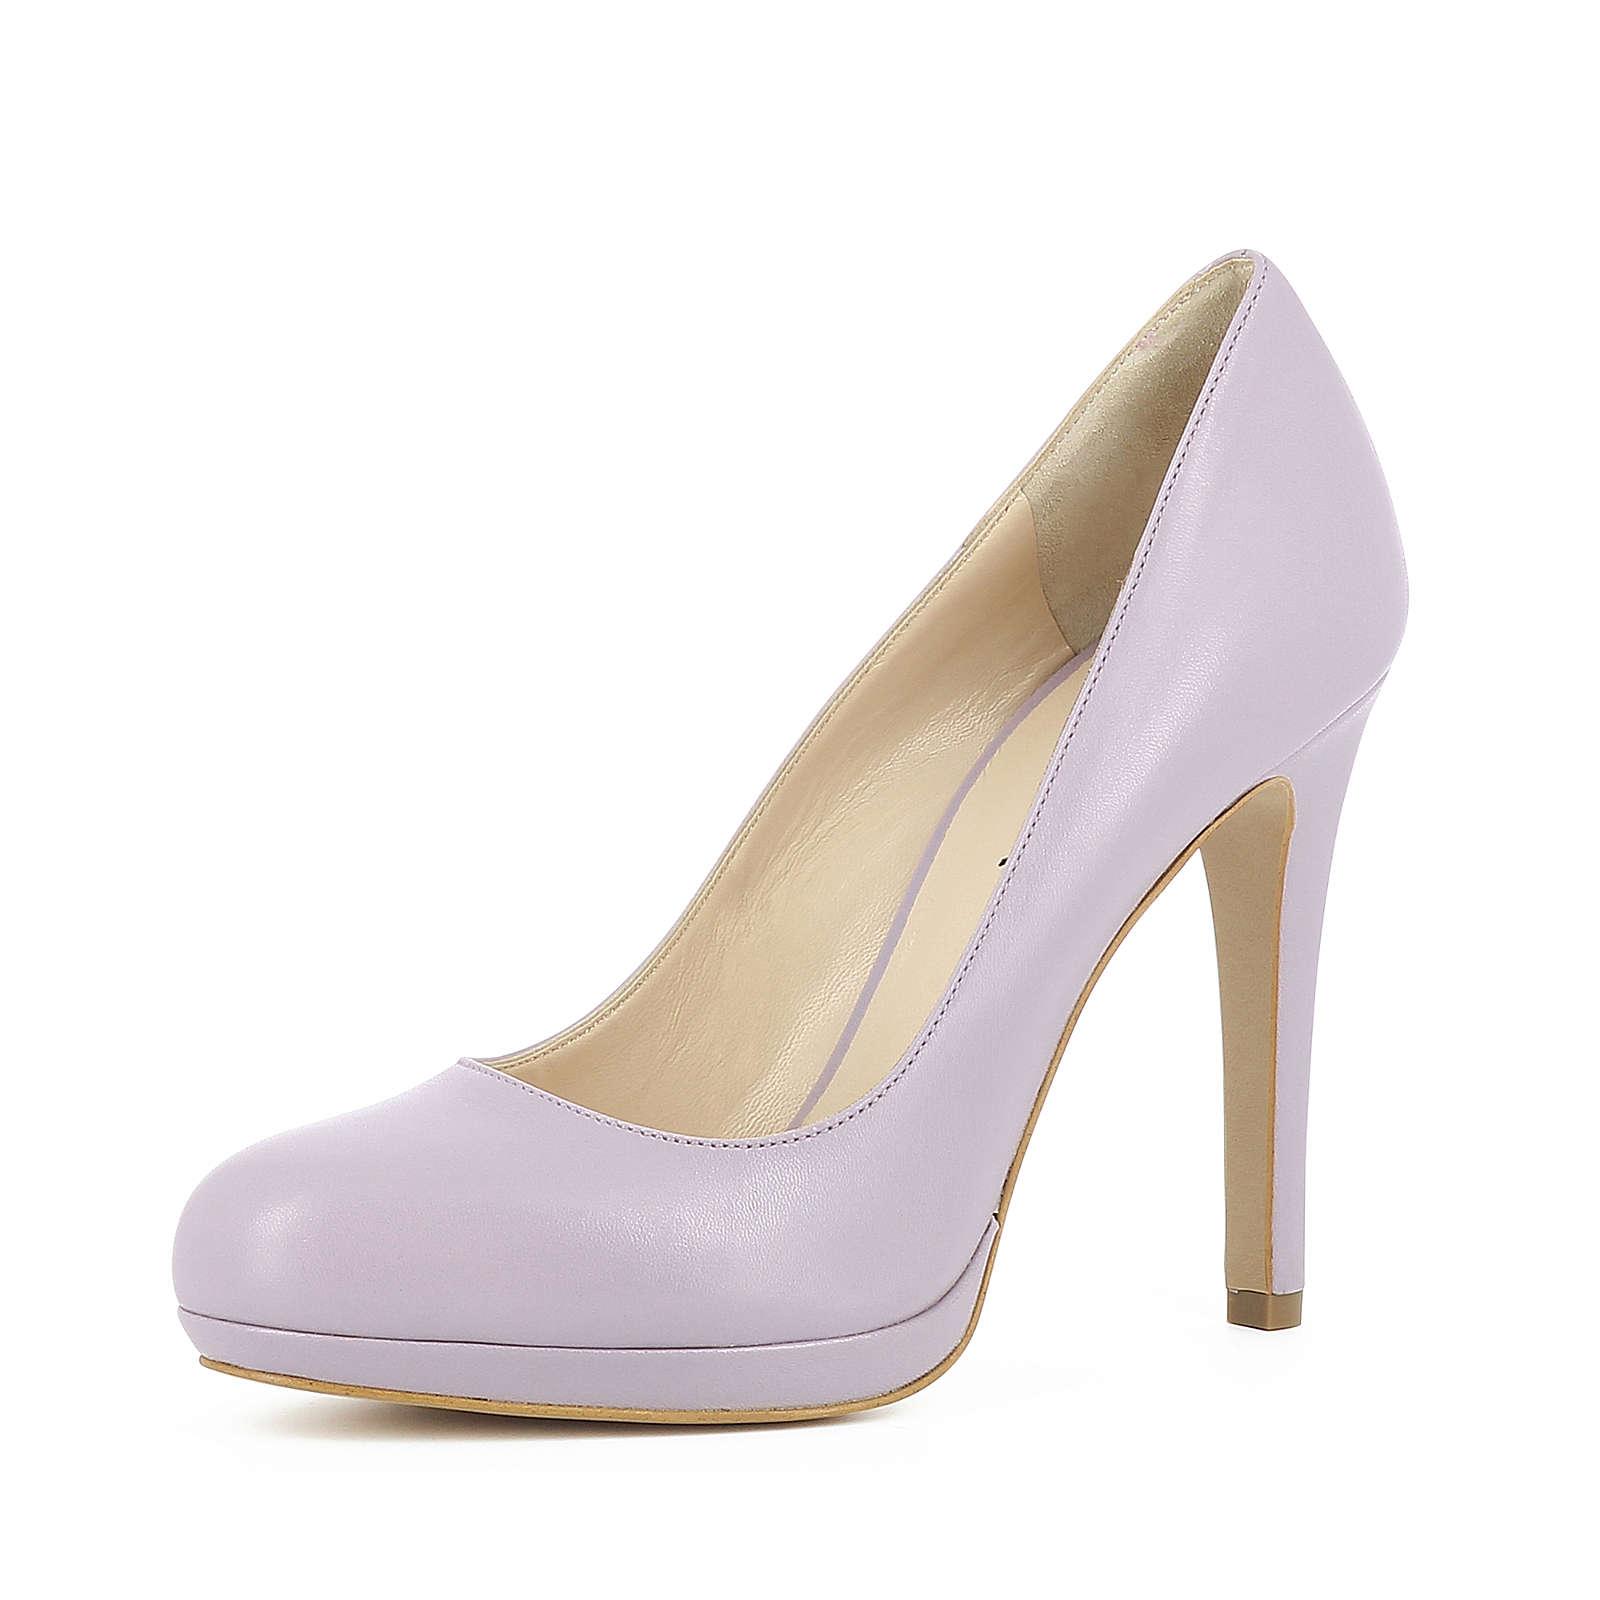 Evita Shoes CRISTINA Plateau-Pumps flieder Damen Gr. 39